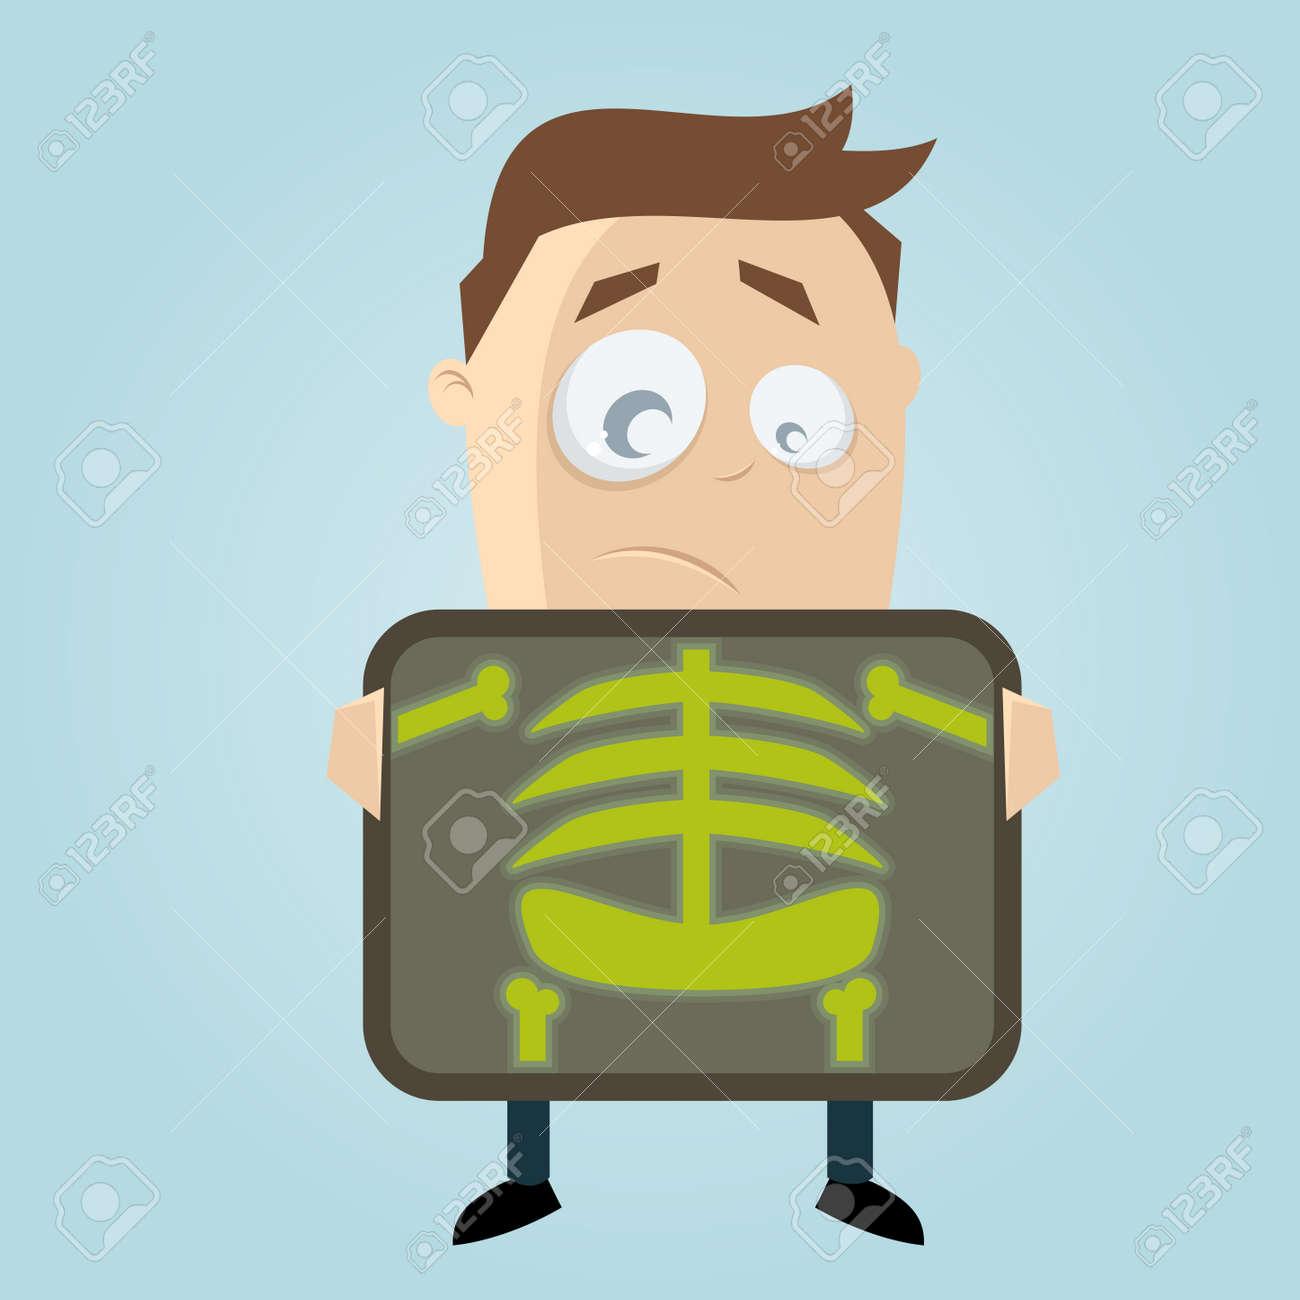 Cartoon-Mann wird immer Röntgenuntersuchung Standard-Bild - 22469437